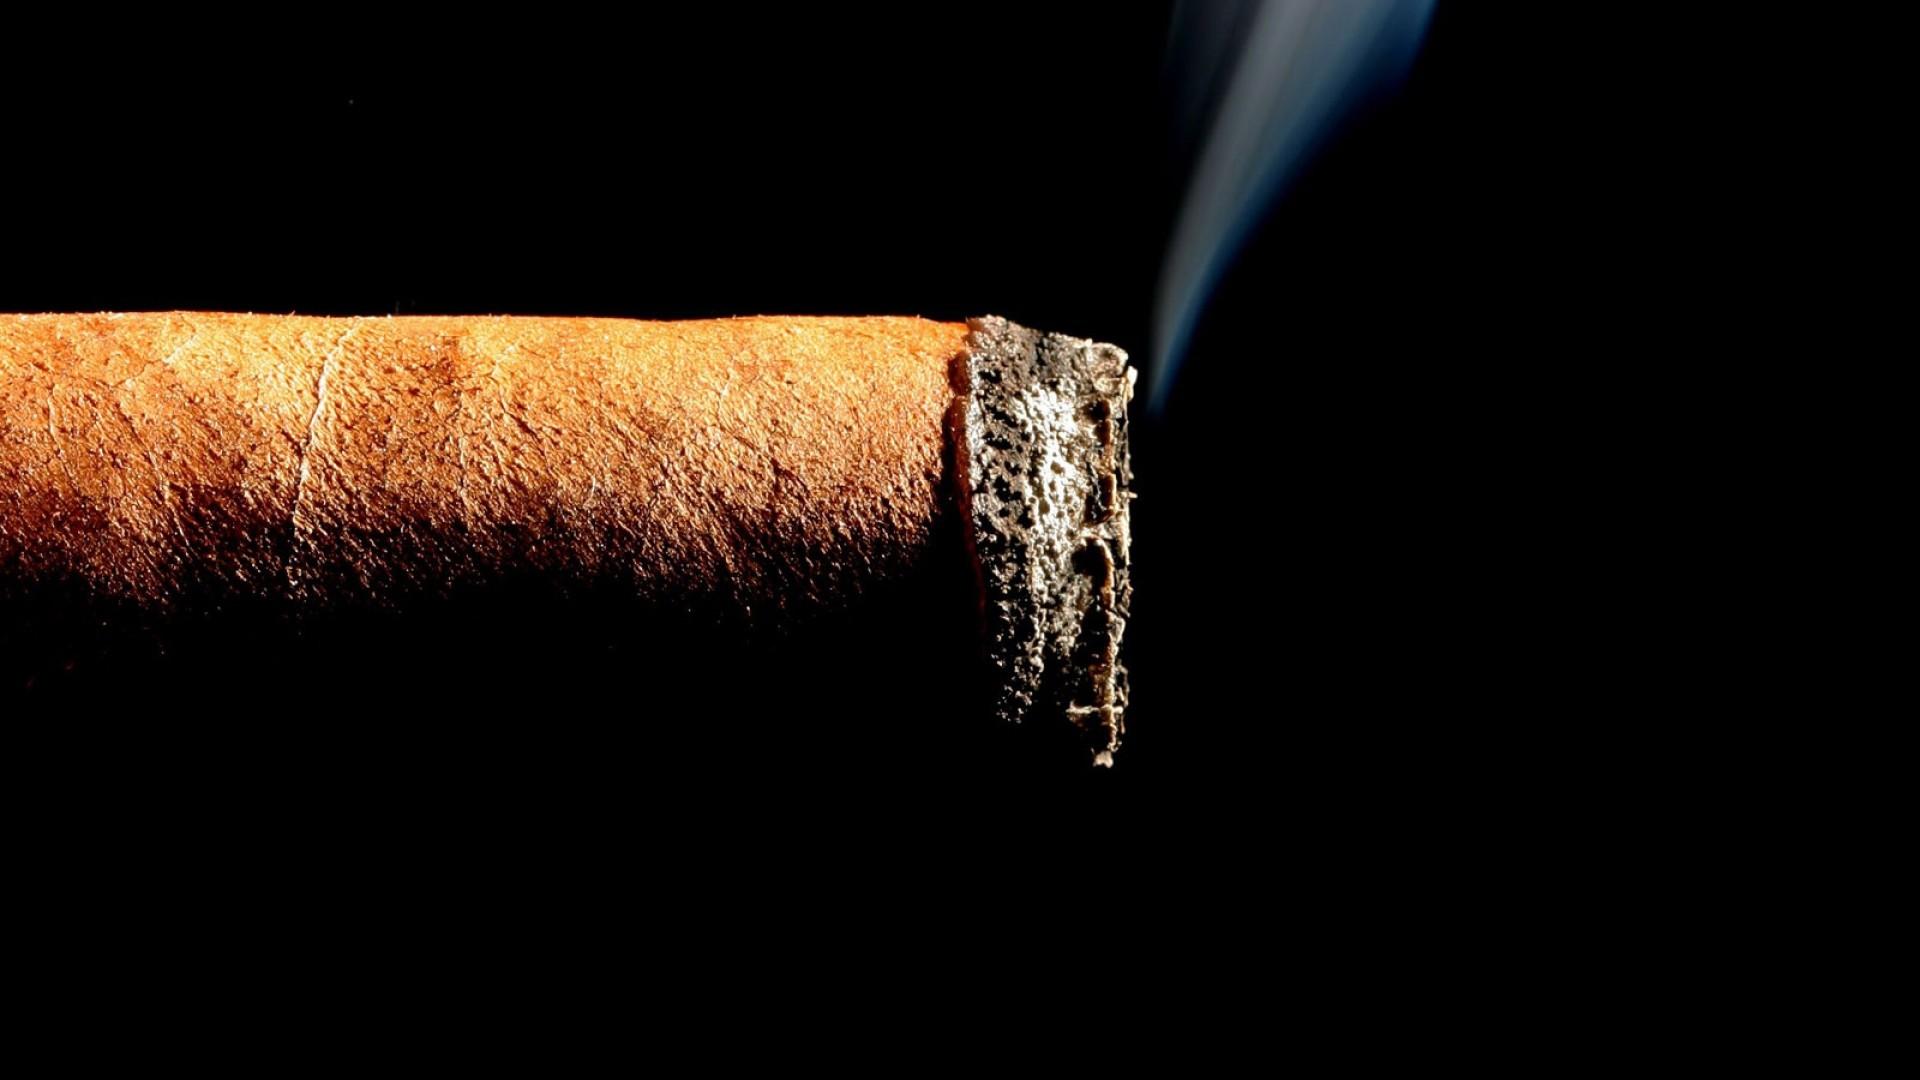 Backwoods Cigars Wallpaper 57 Images